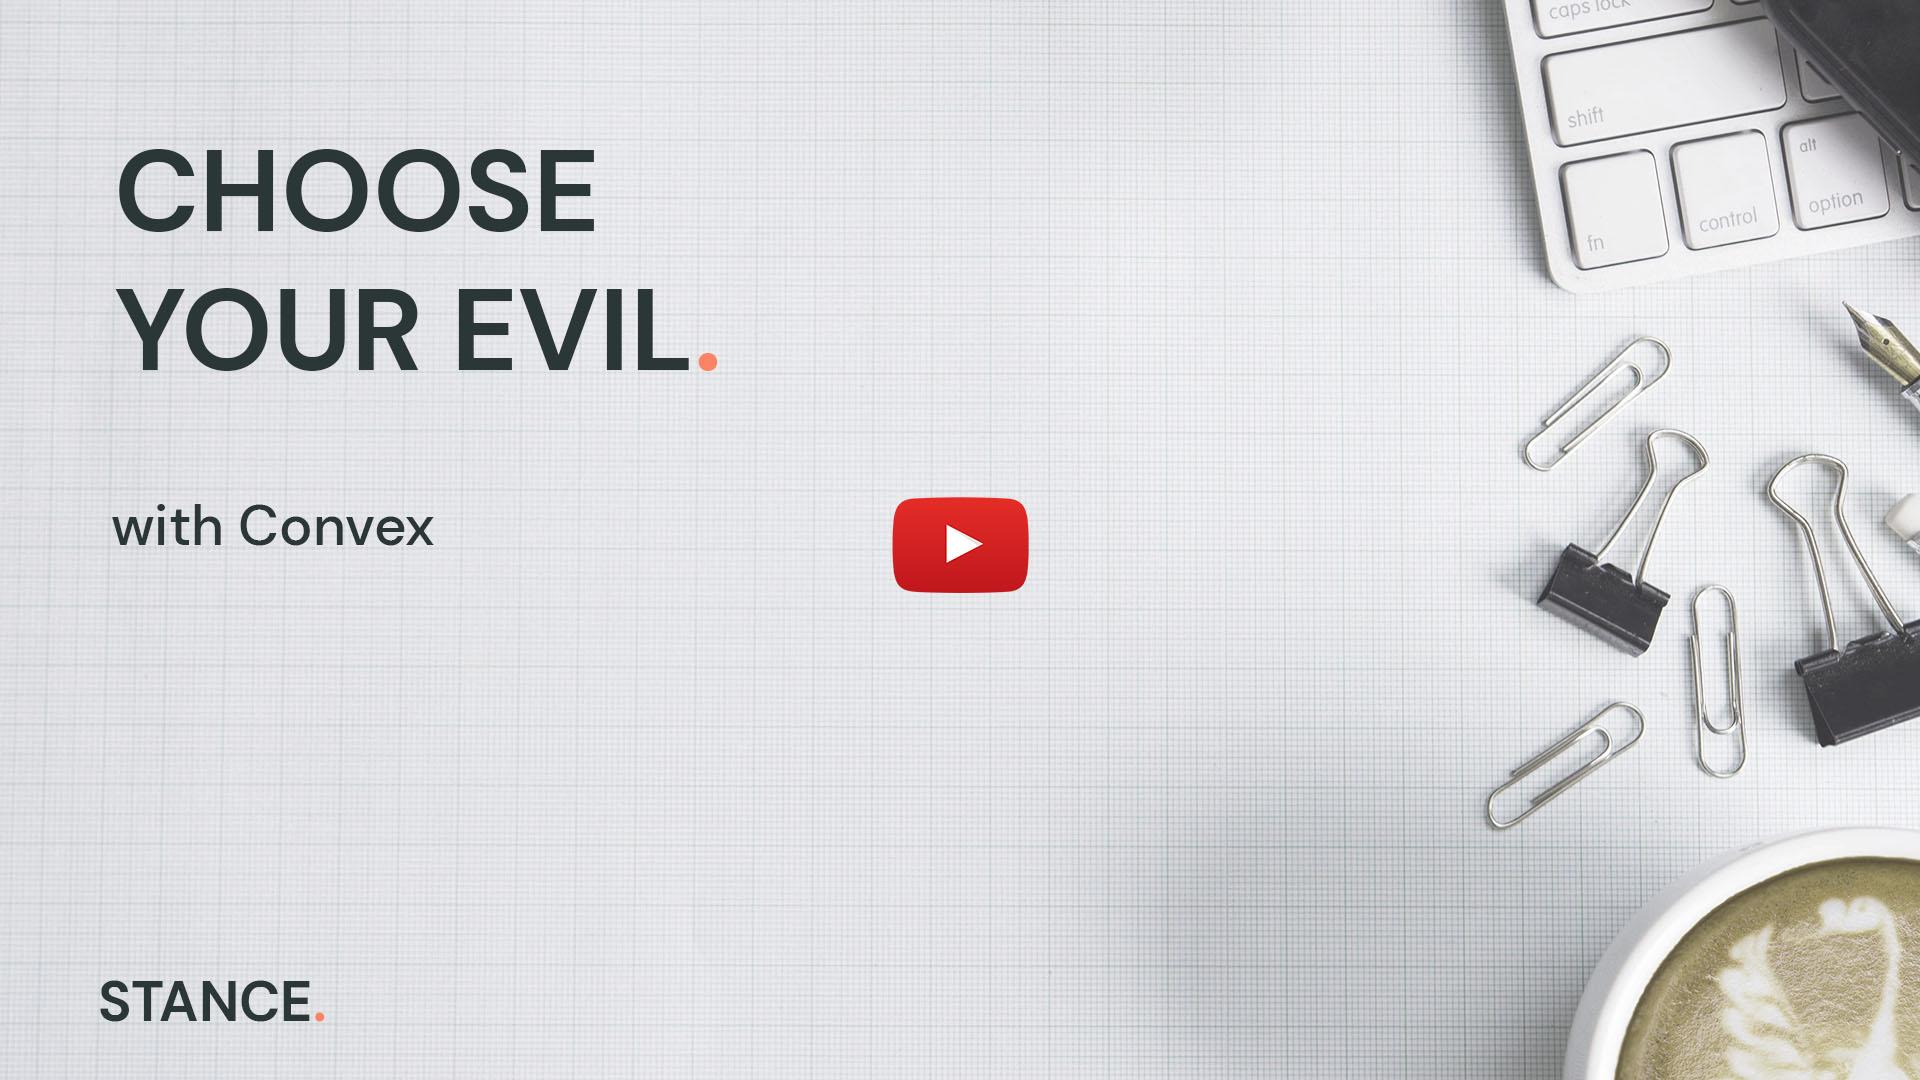 Choose your evil